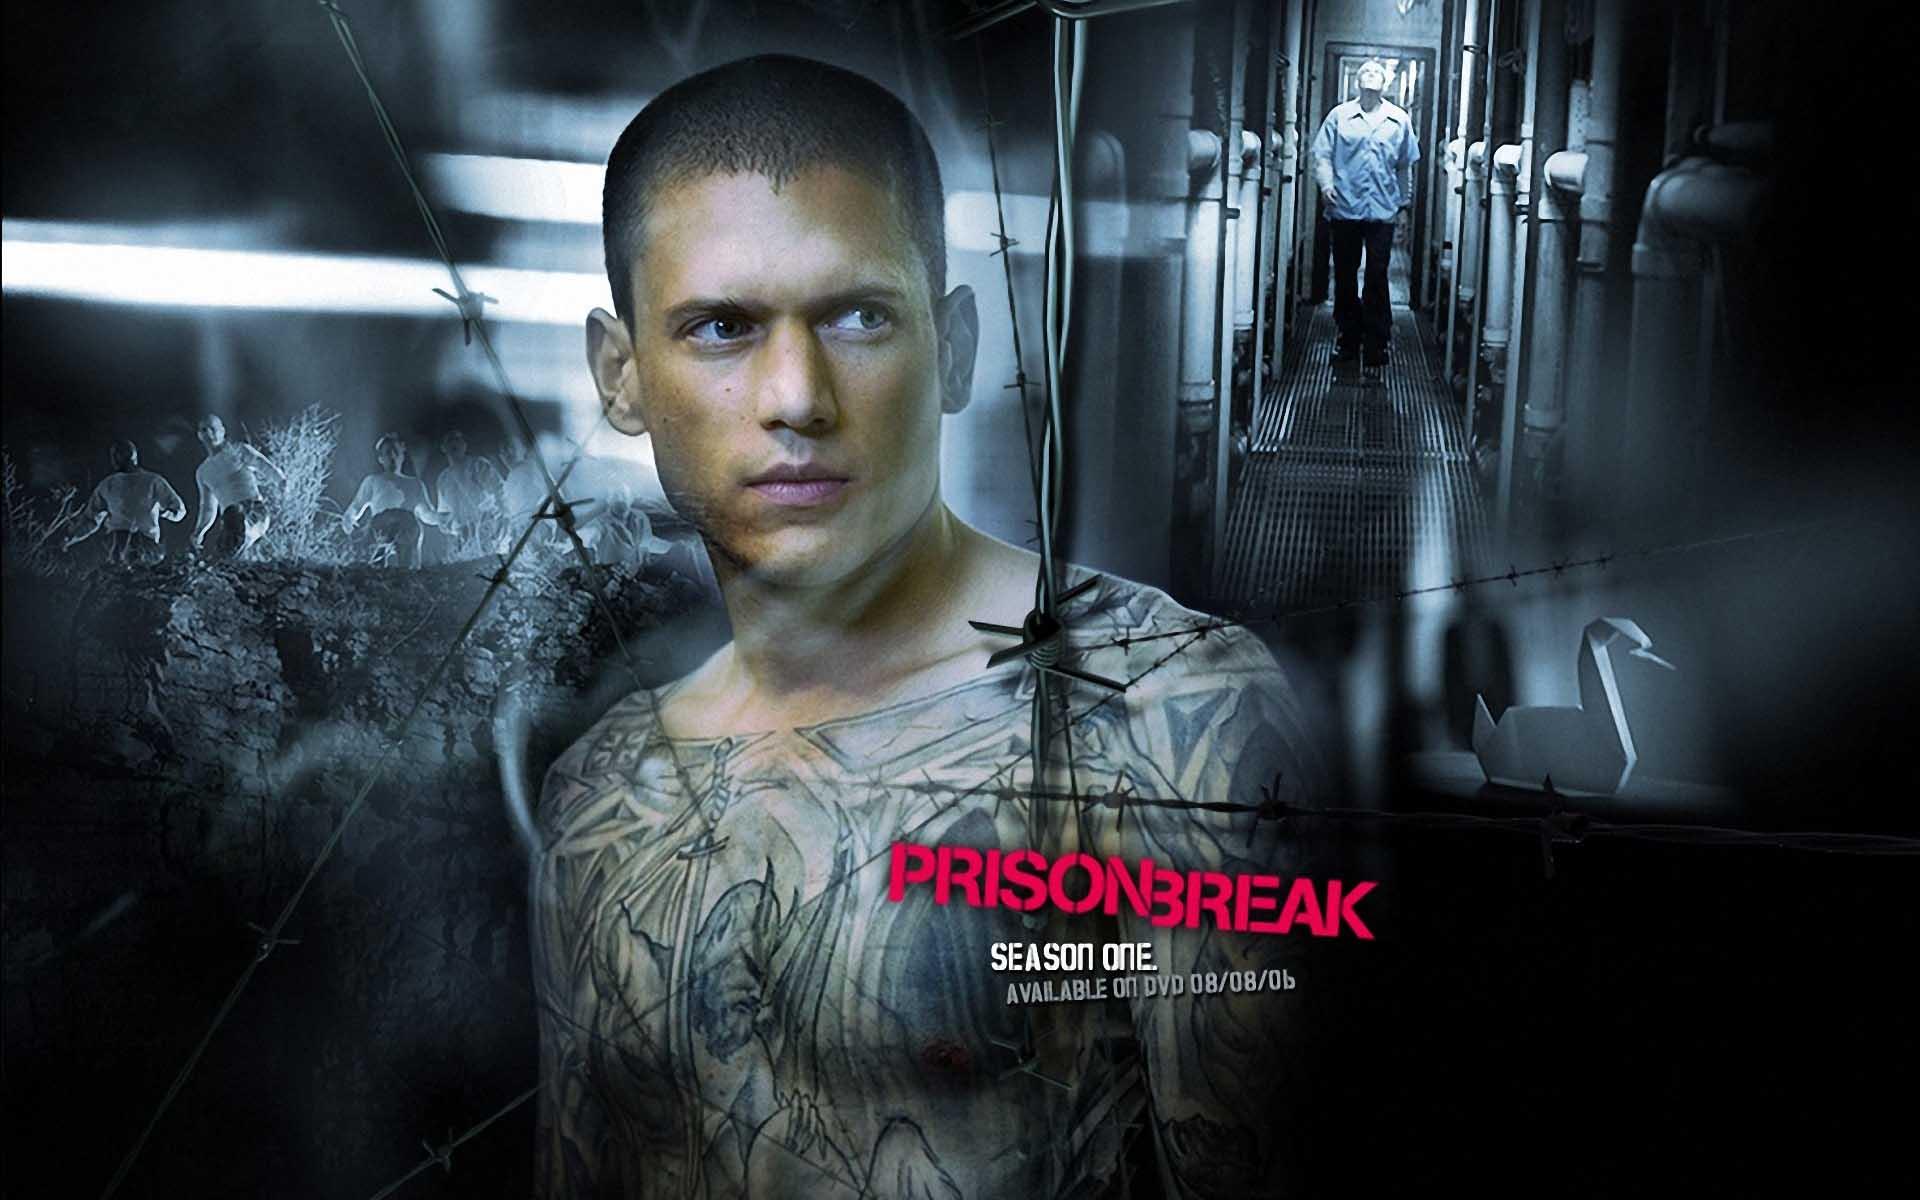 prison break season 1 episode 1 download hd